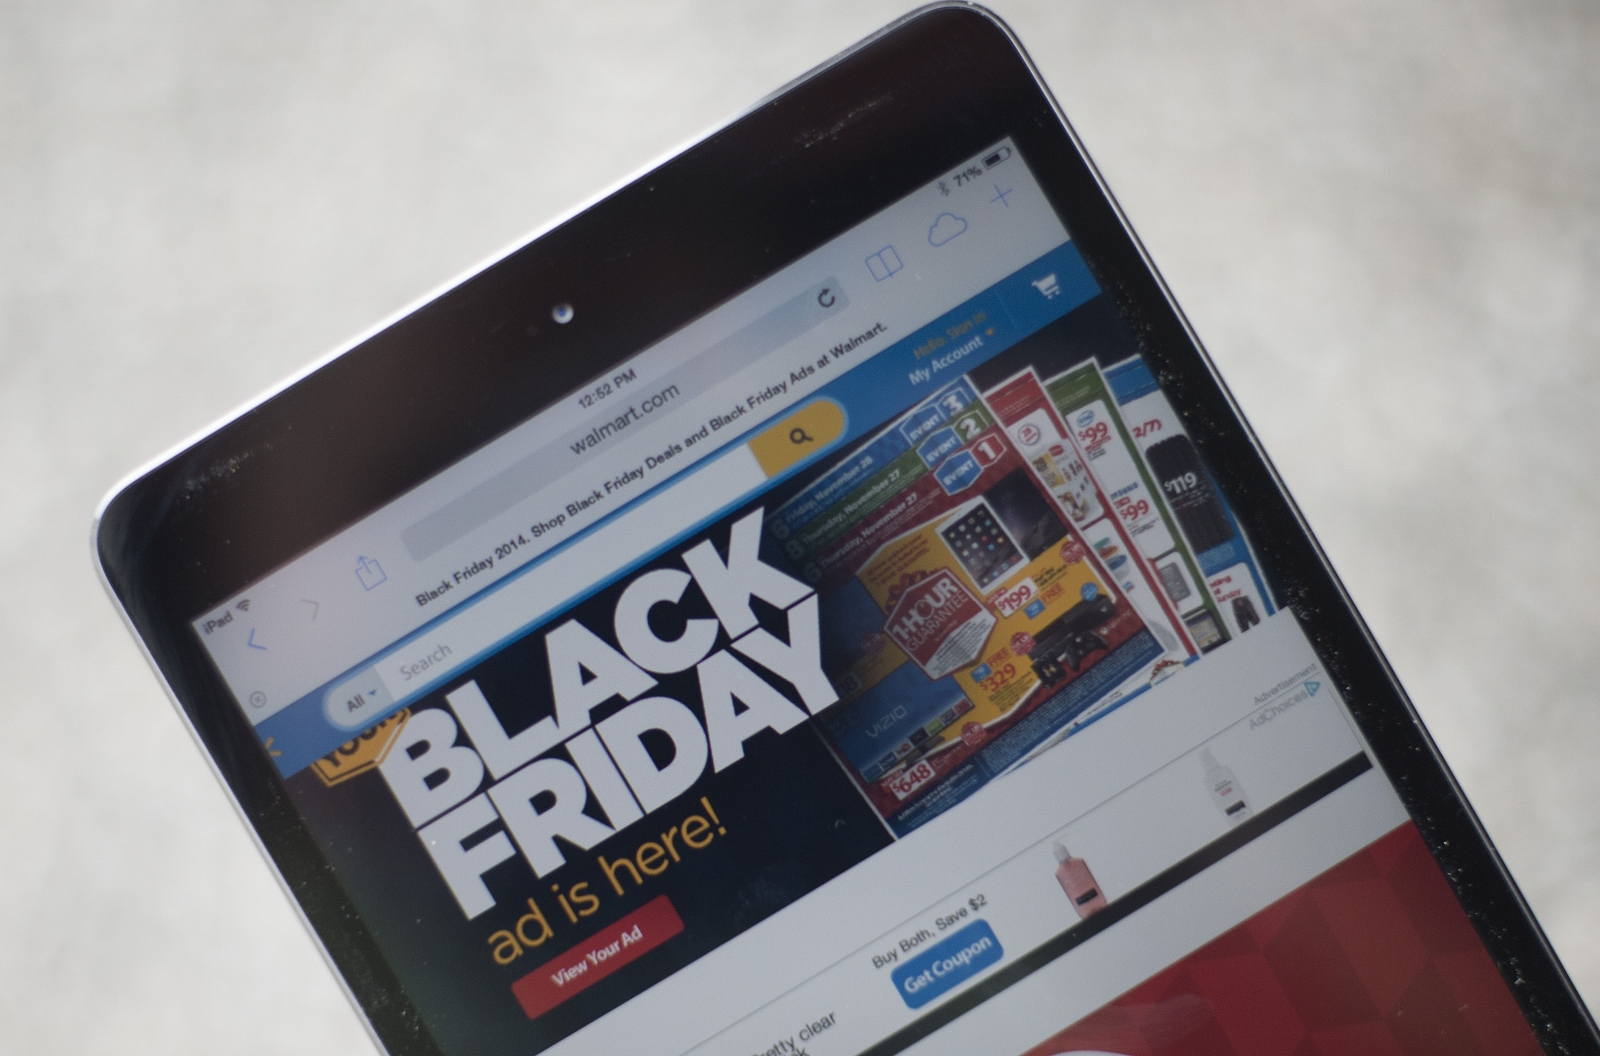 Black Friday Deals Live Blog The Best Uk Specials On